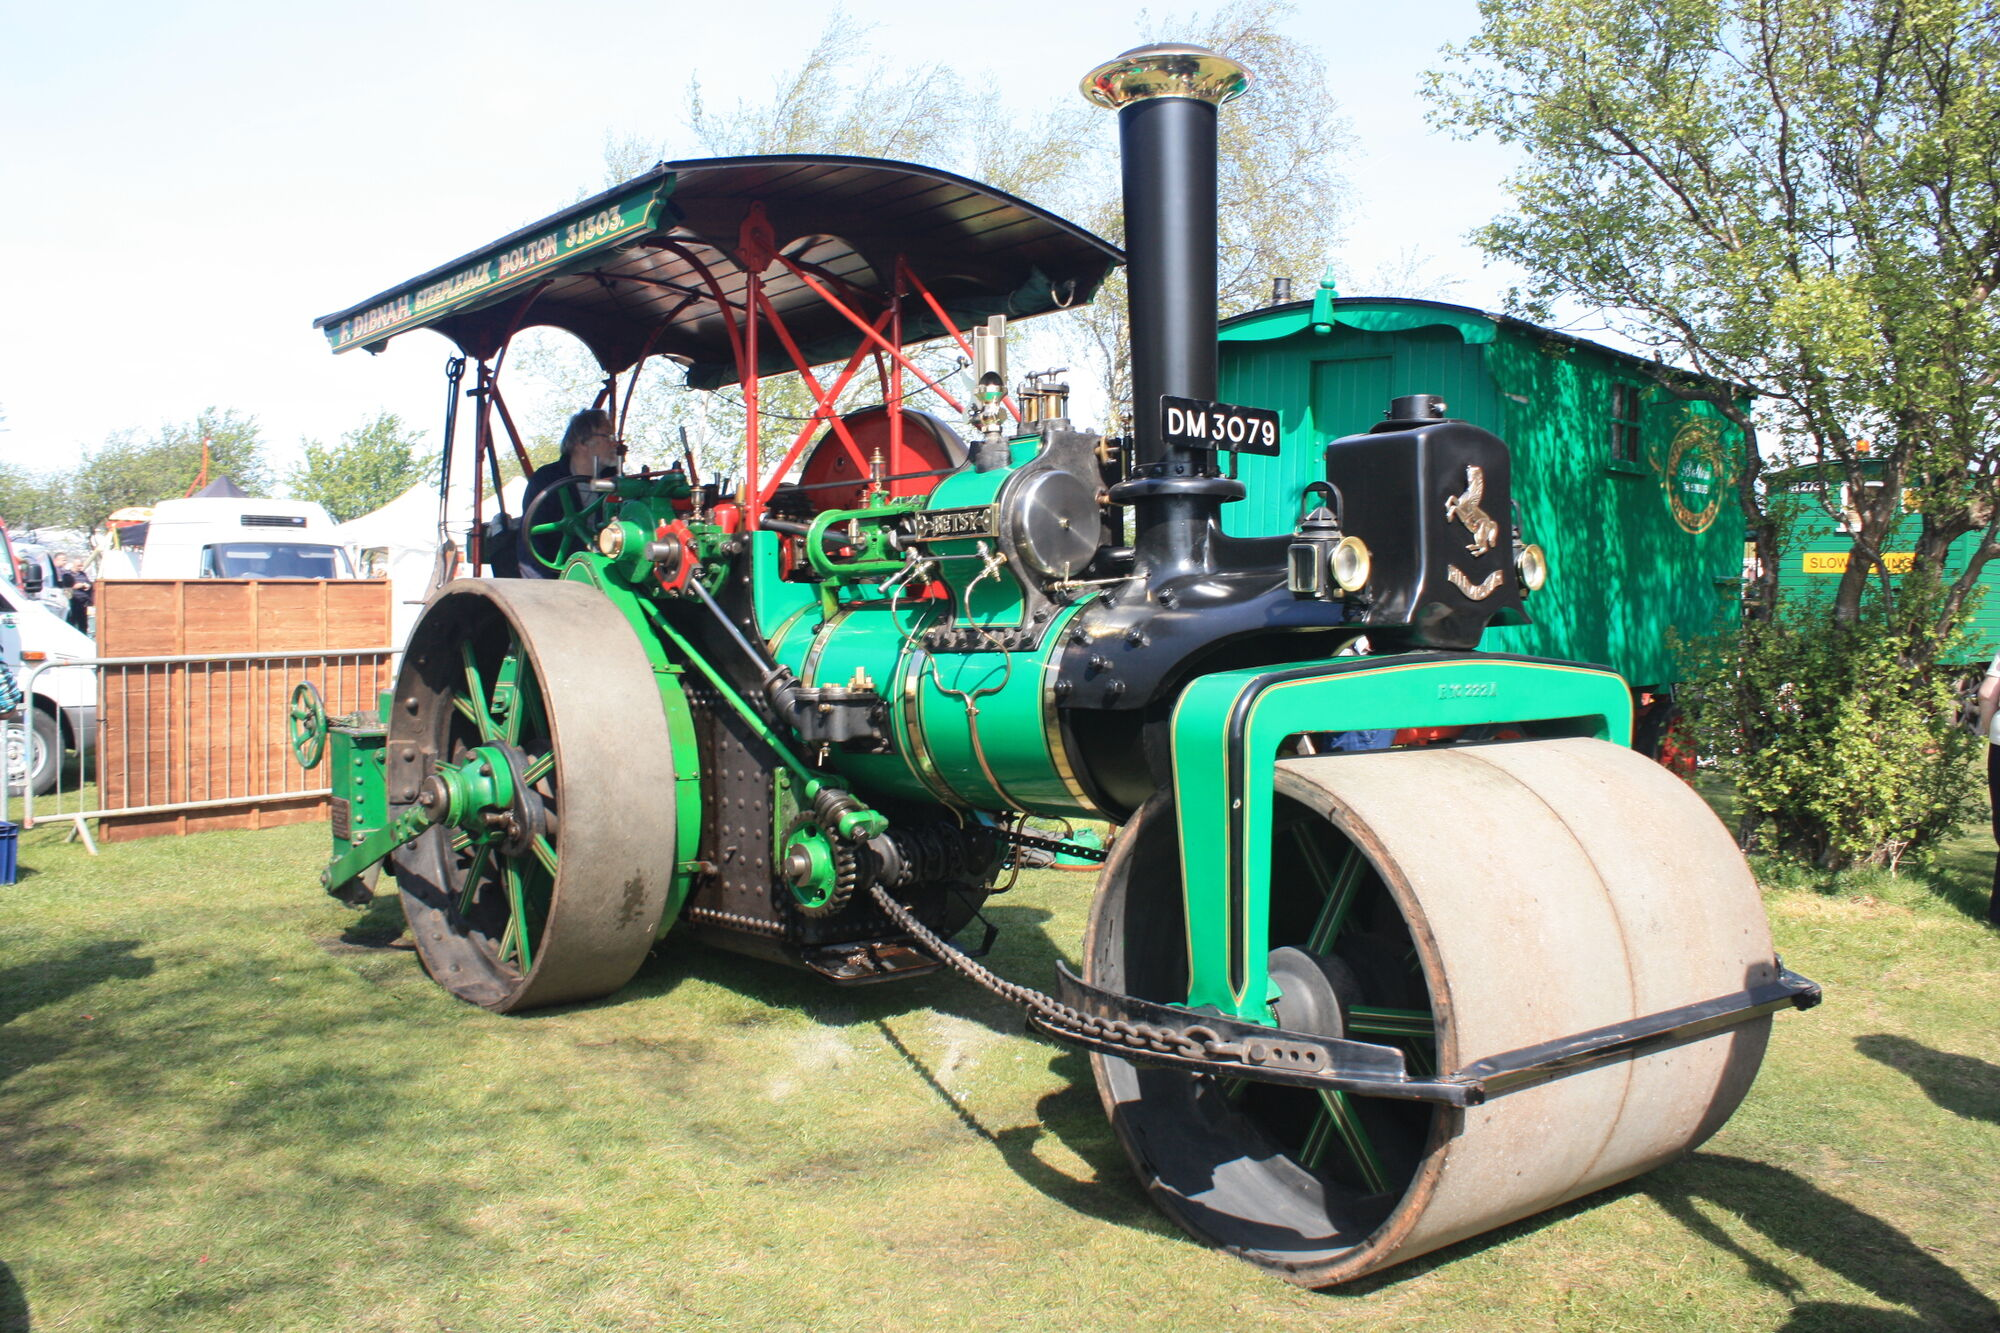 Aveling porter no 7632 tractor construction plant wiki fandom powered by wikia - Porter international wiki ...